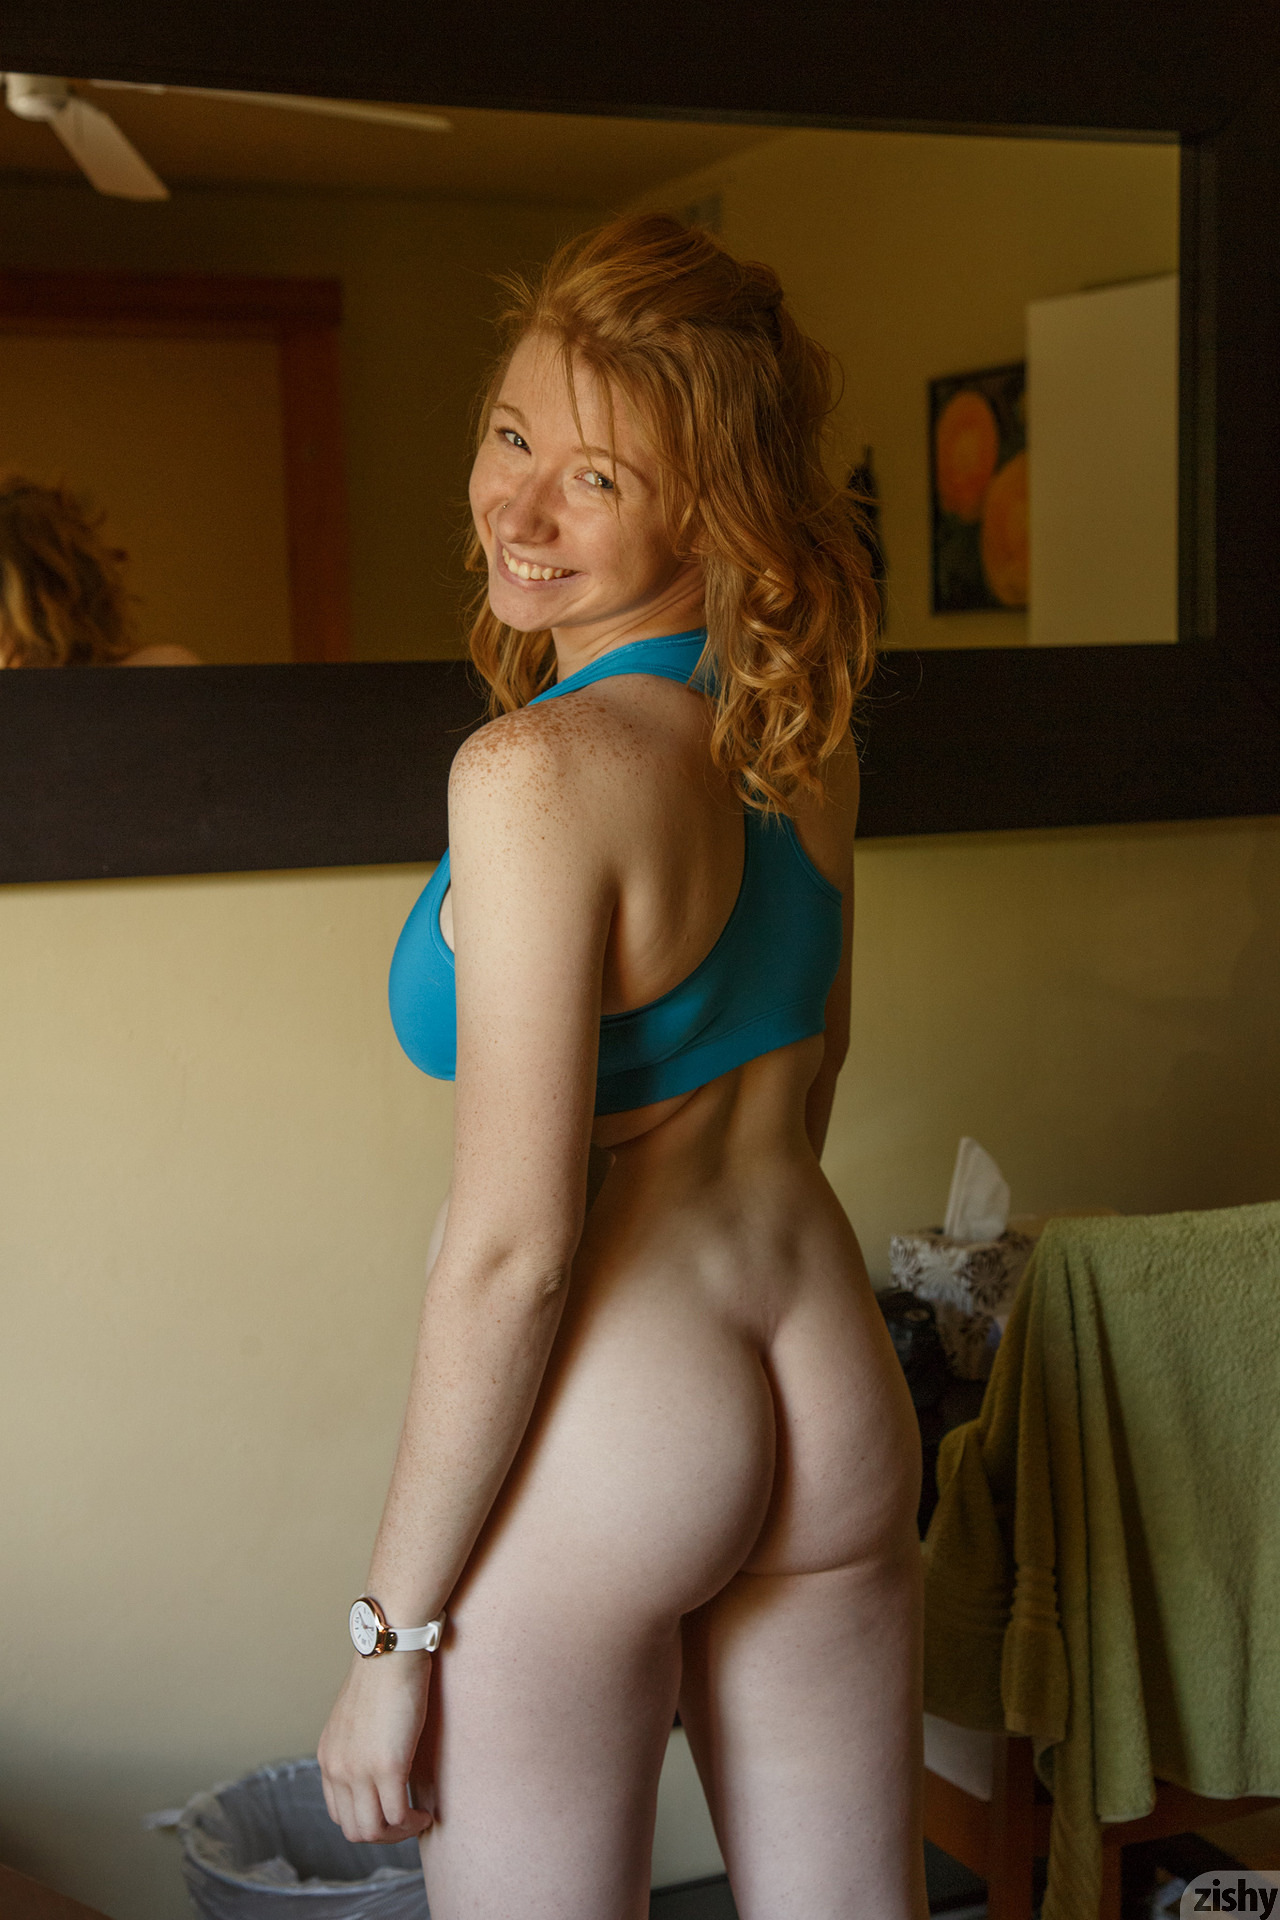 Irelynn Dunham Shake And Bake Zishy (7)